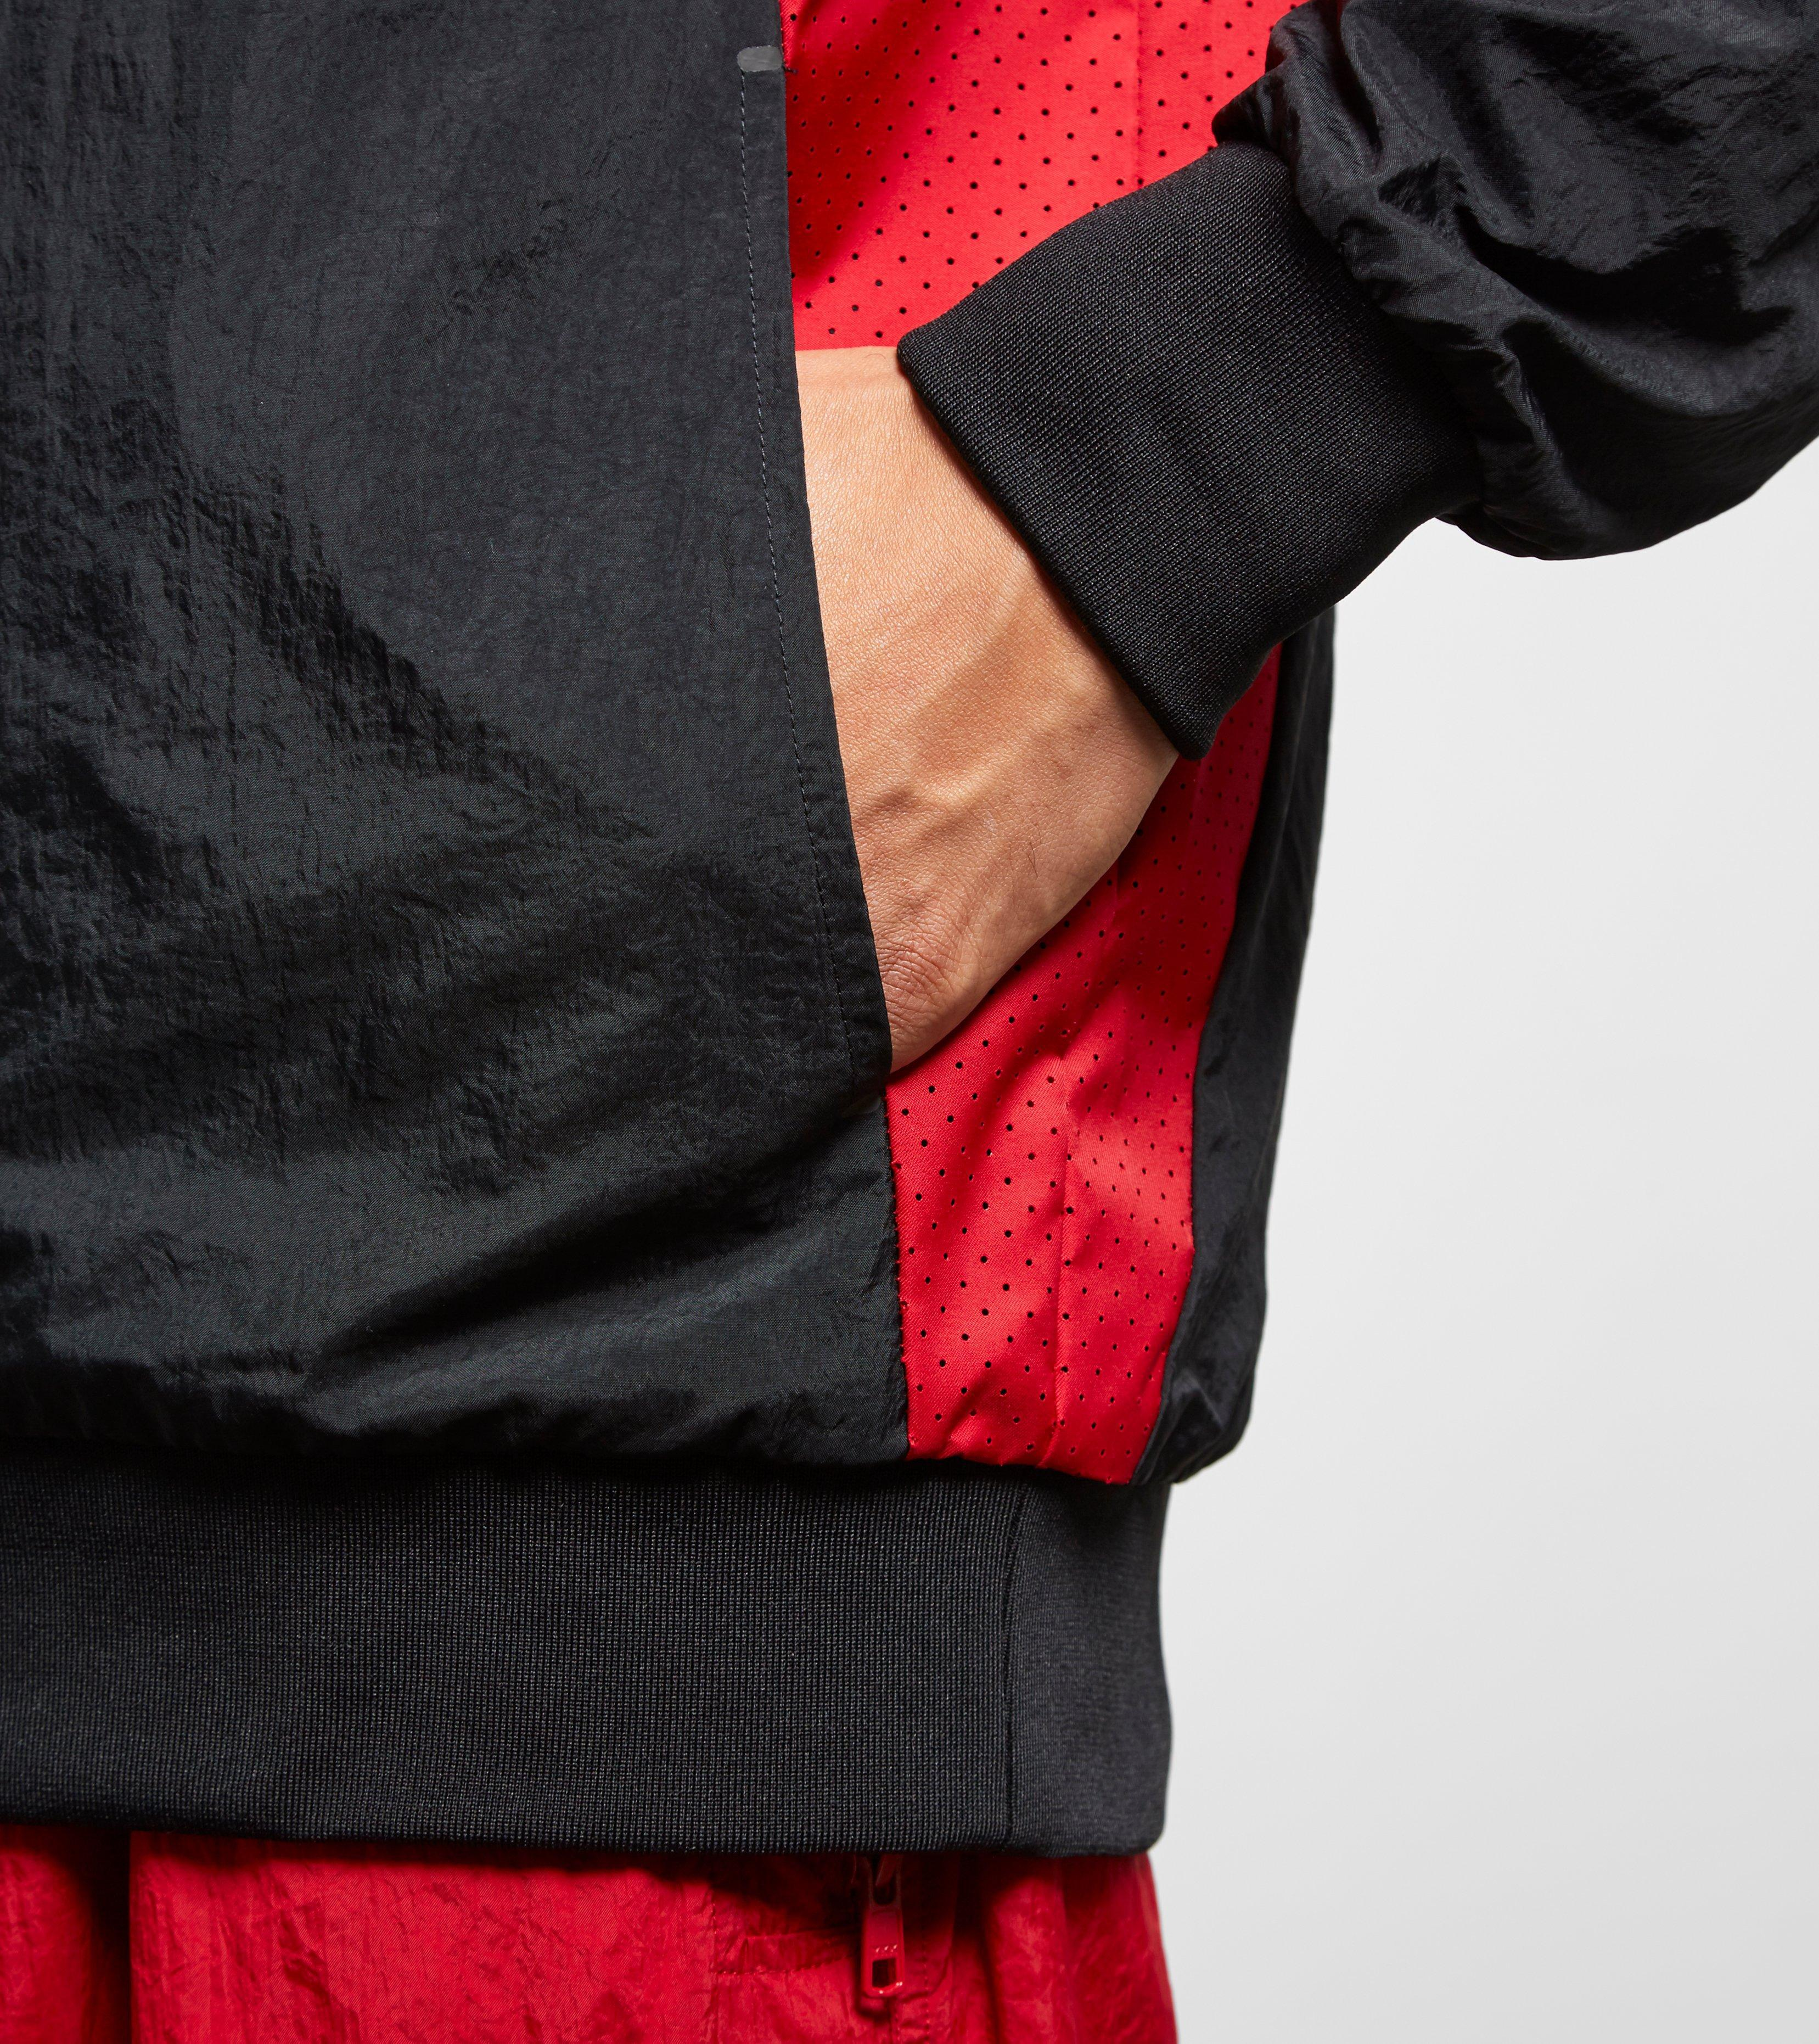 952ce2595dae04 Nike Jsw Wings Muscle Jacket in Red for Men - Lyst